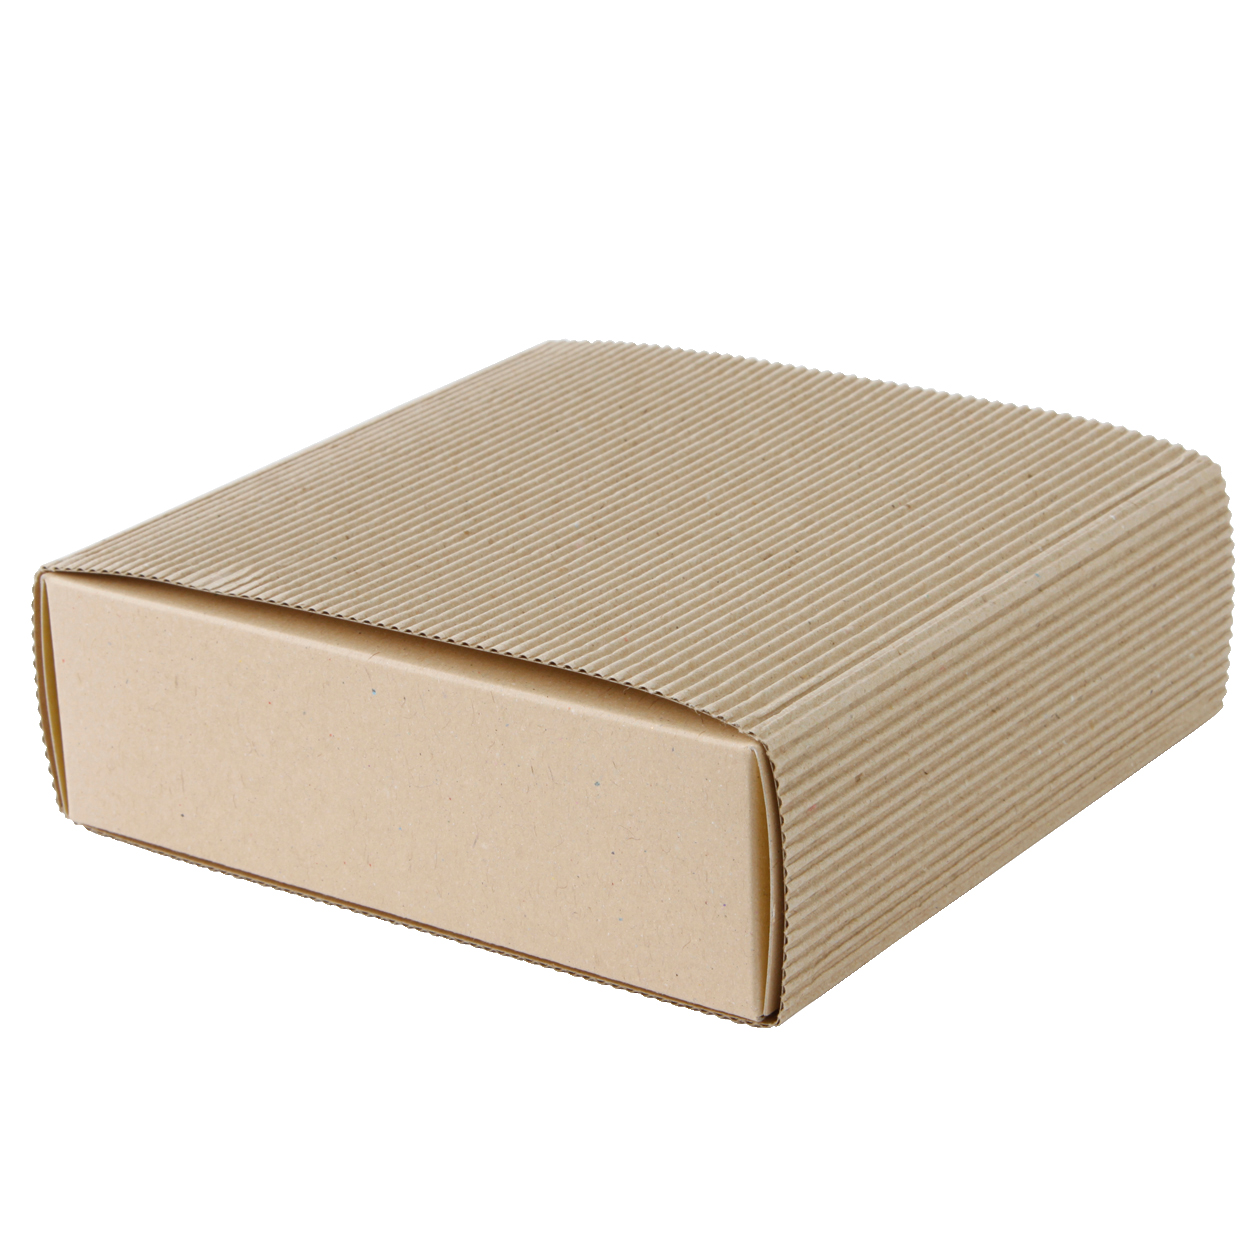 GIFT BOX 160*160*50mm | MUJI